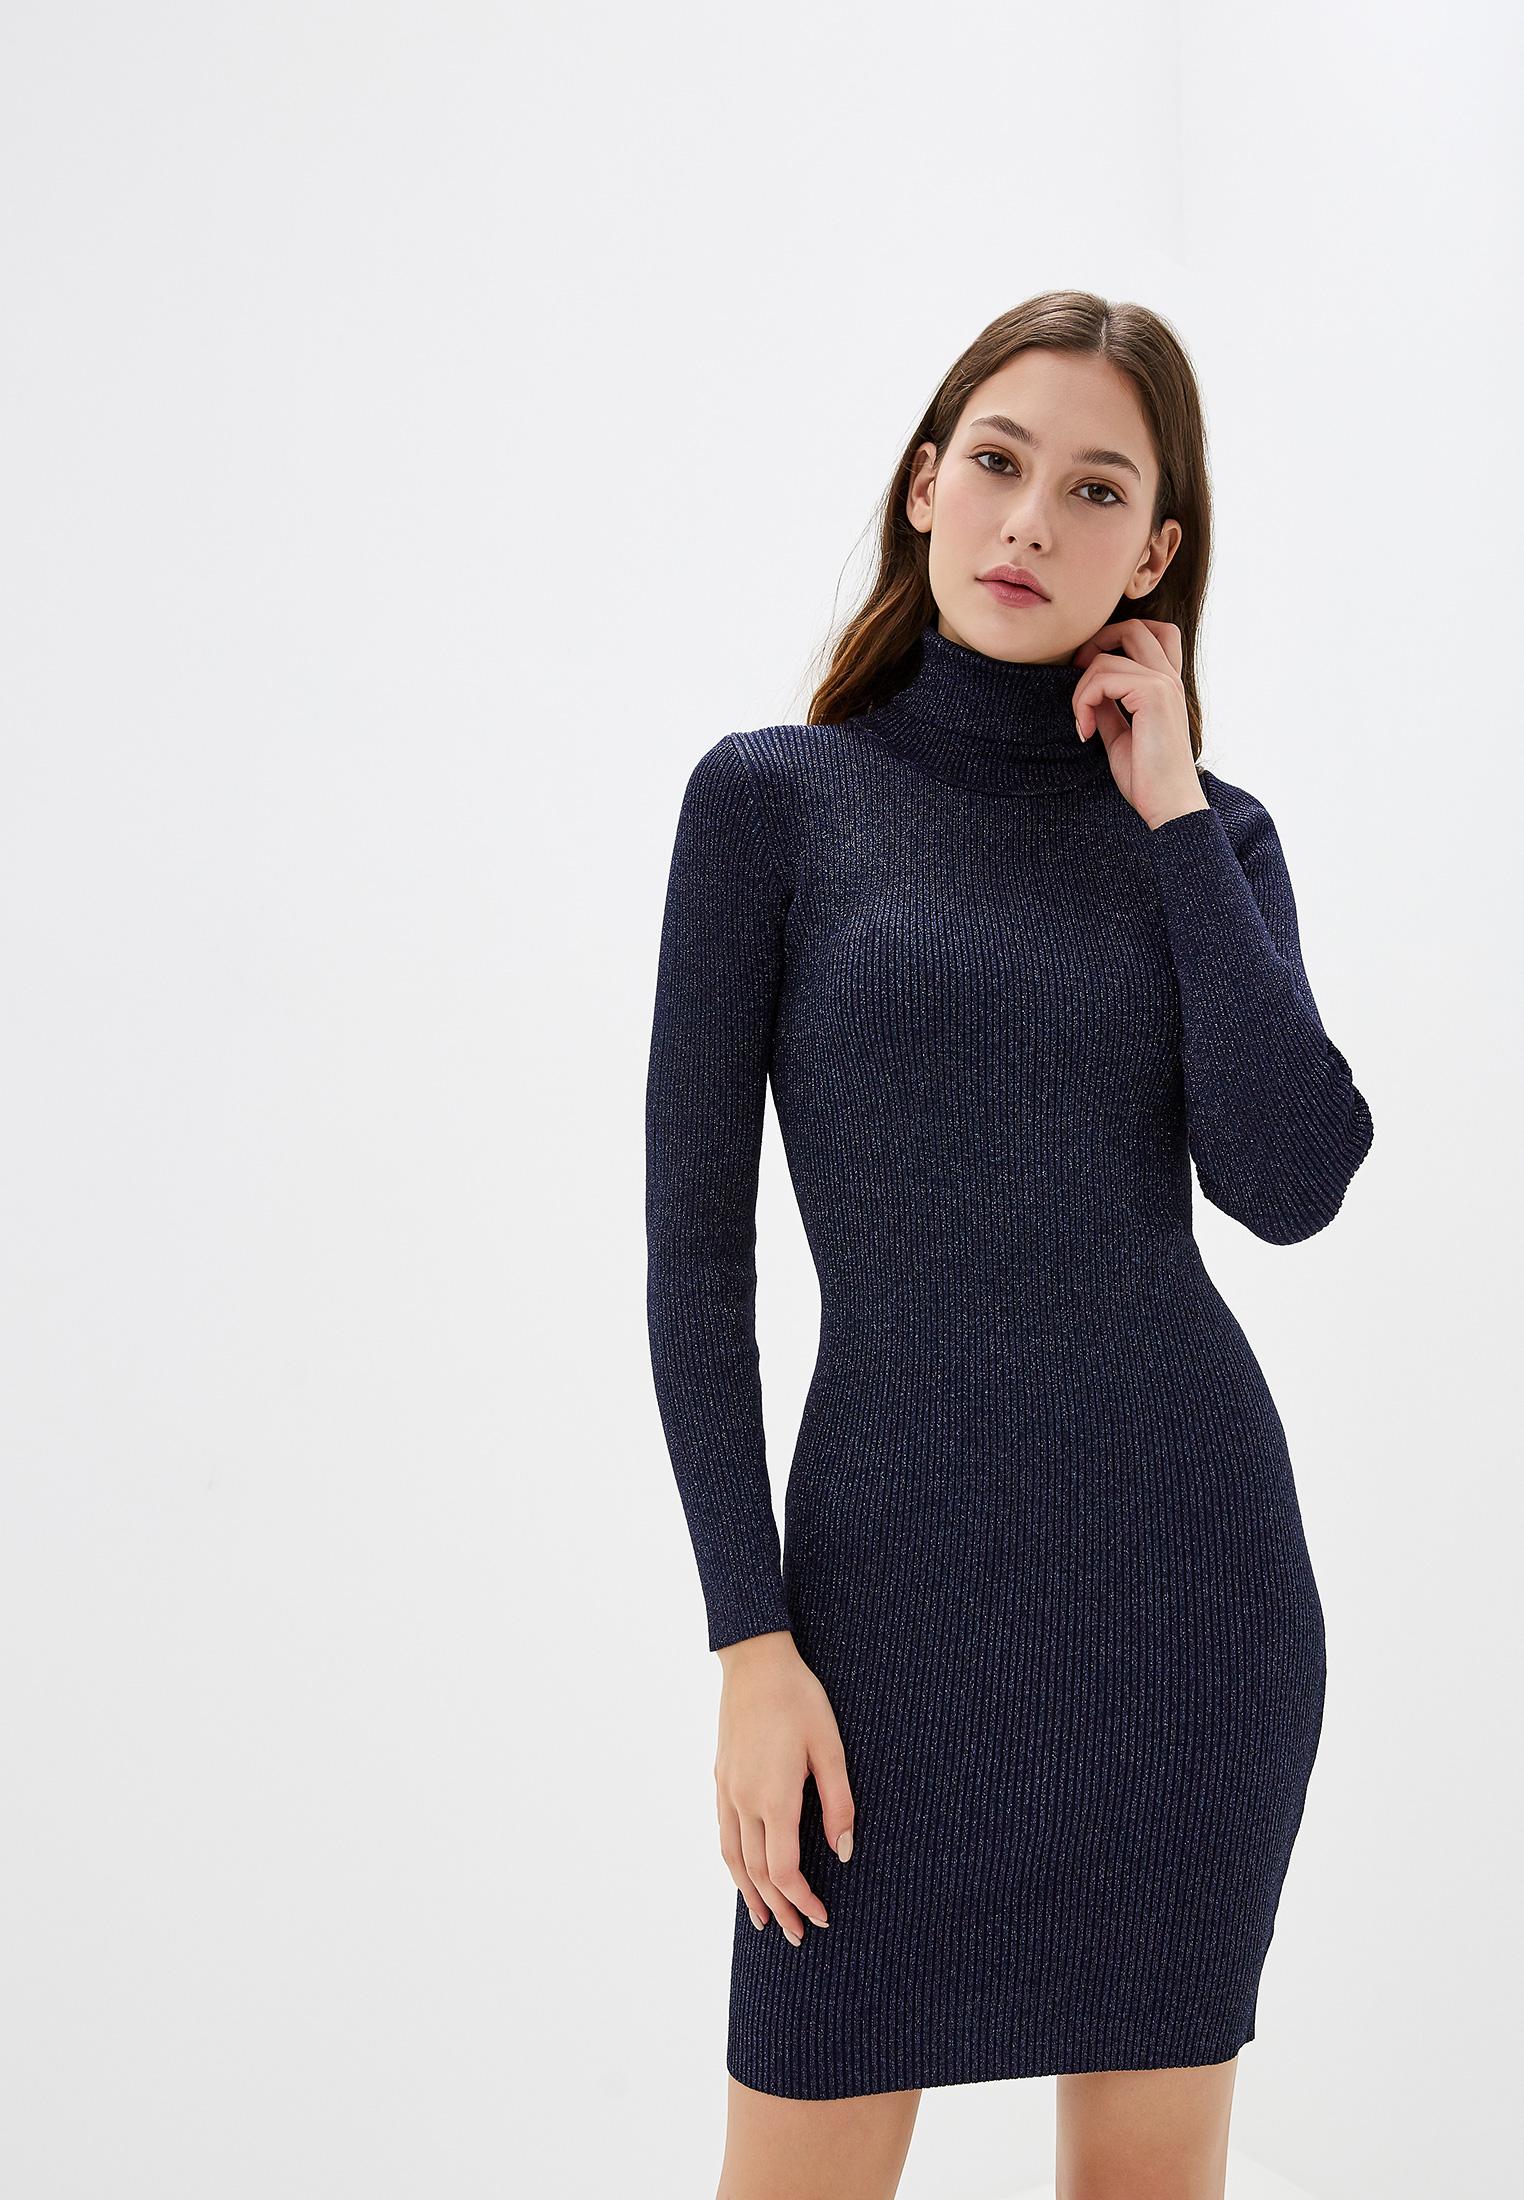 Вязаное платье Liana L412-1